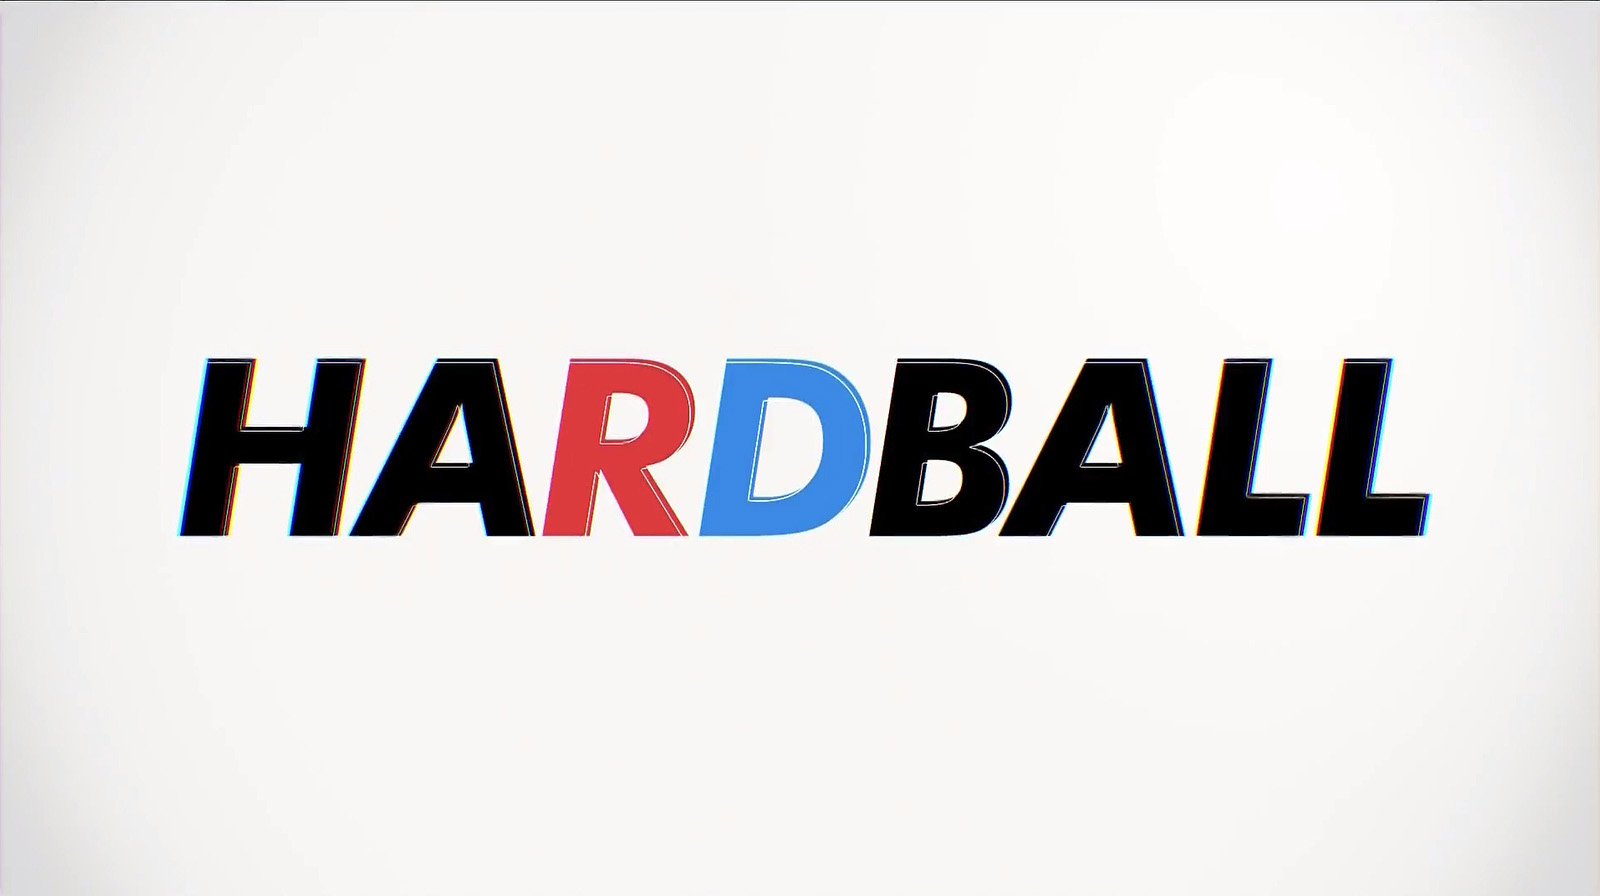 NCS_MSNBC-Hardball-20-Motion-Graphics_0002